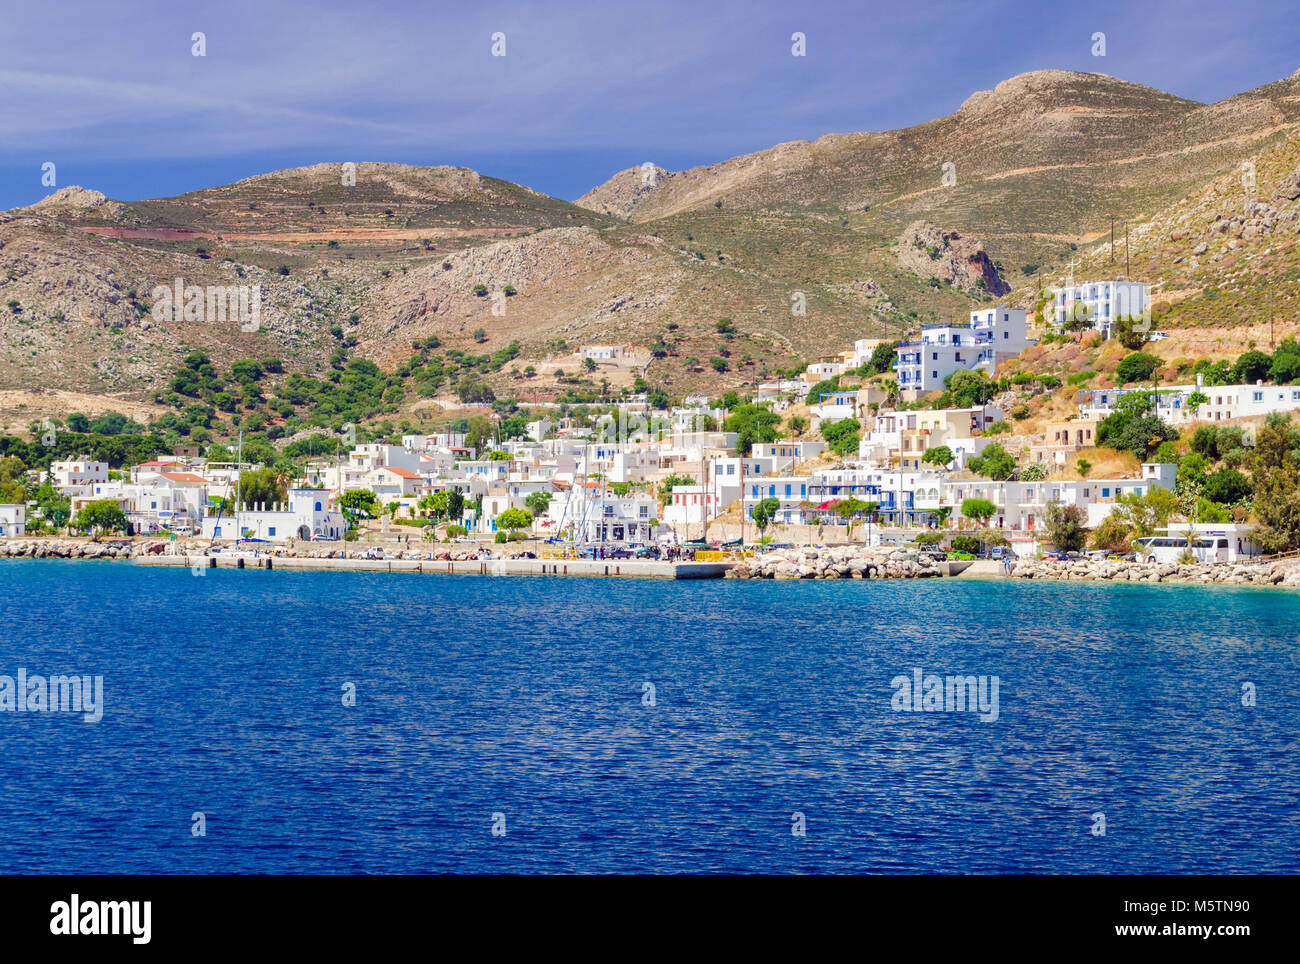 Livadia Port auf Tilos Island, Dodekanes, Griechenland Stockbild